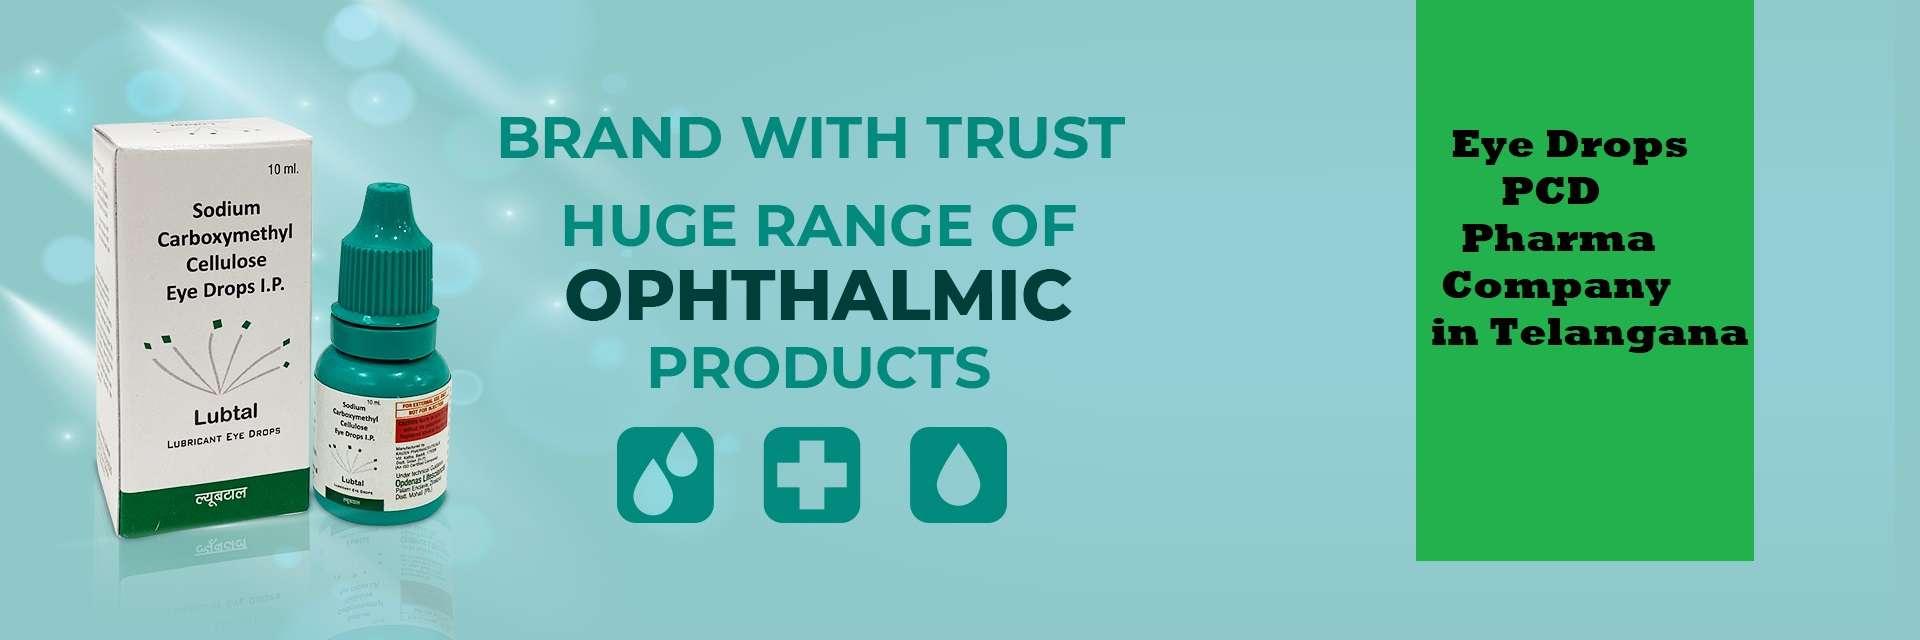 Eye Drops PCD Pharma Company in Telangana